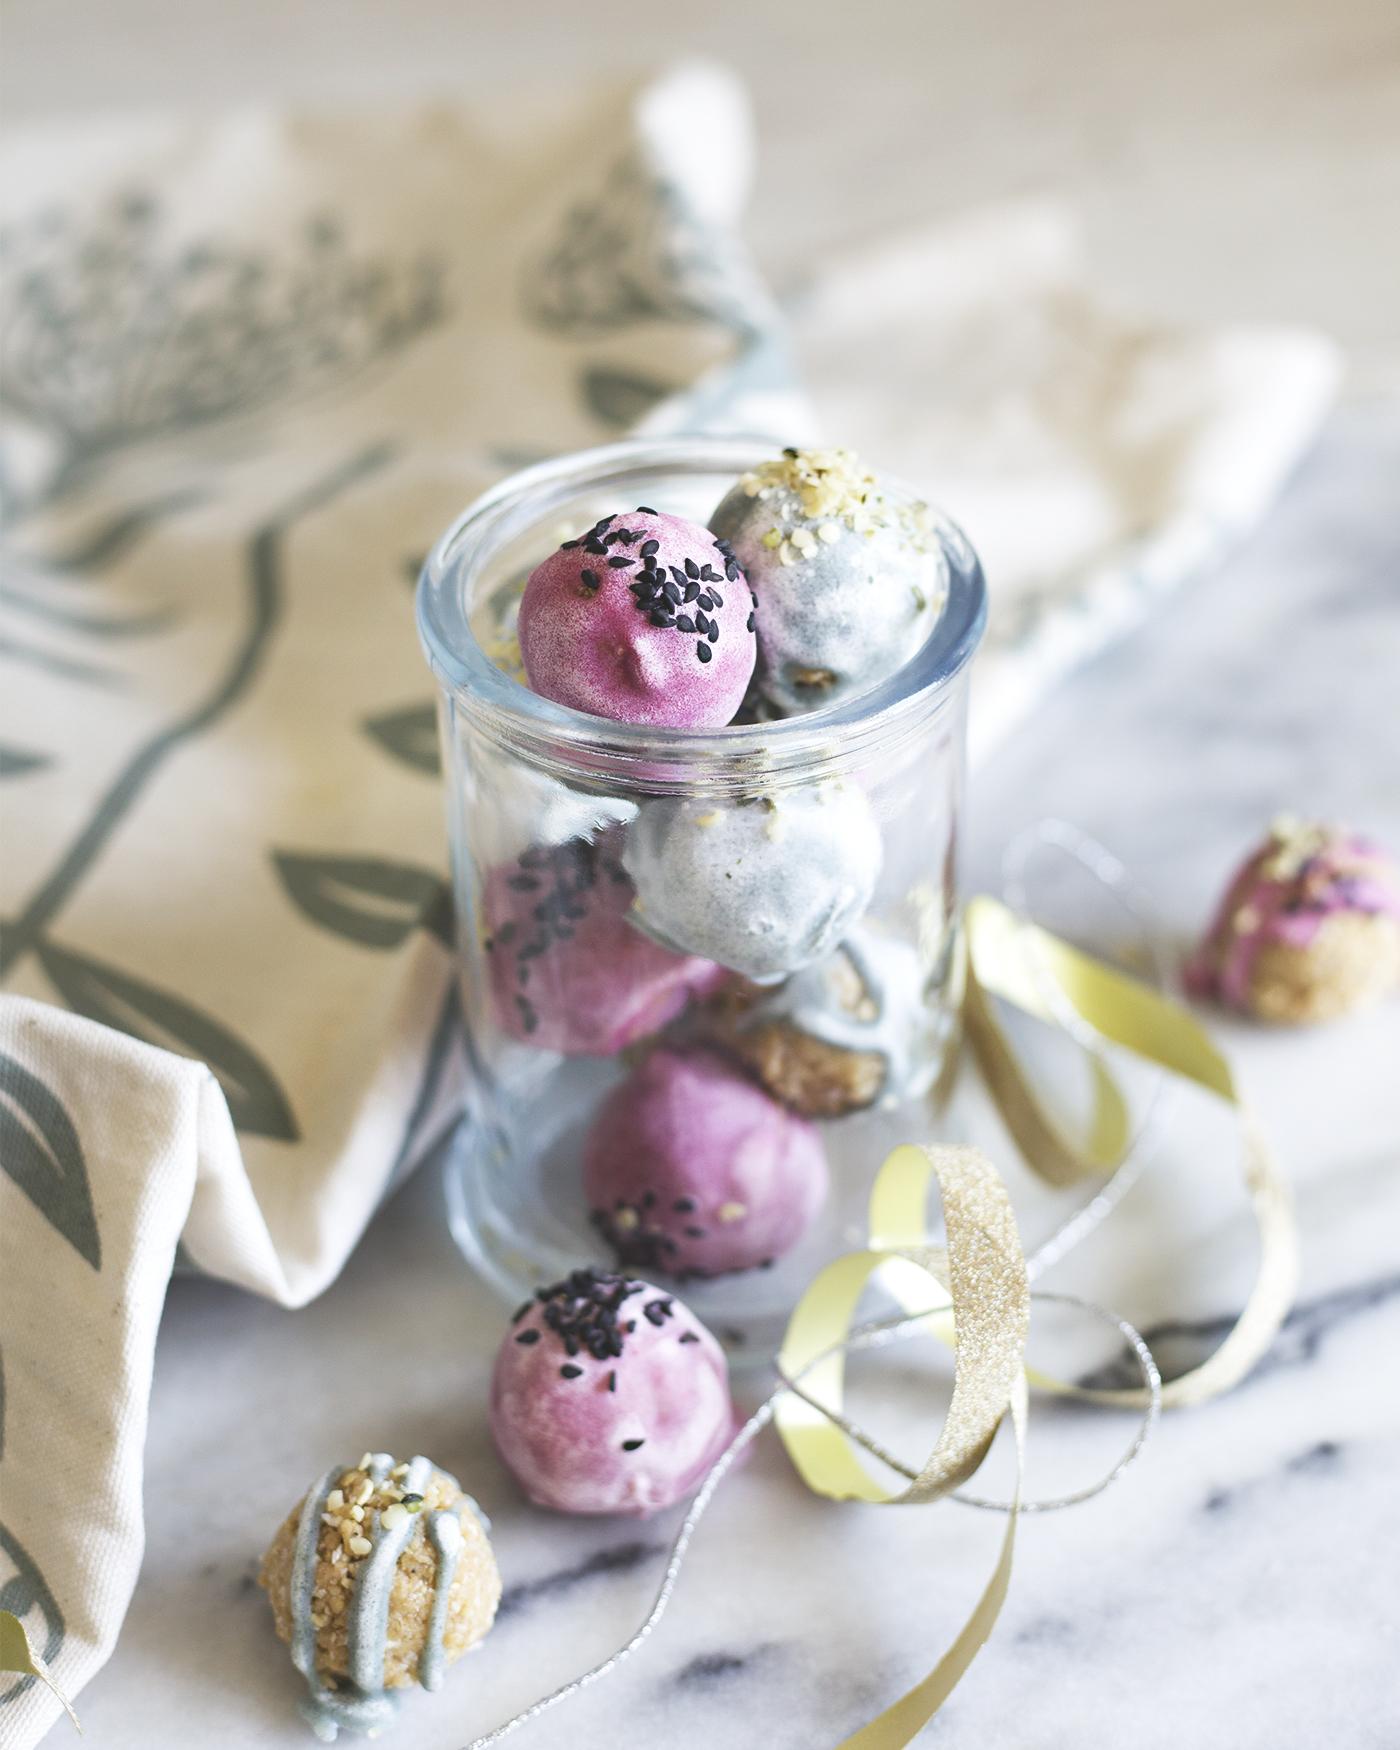 Yummy CBD protein balls